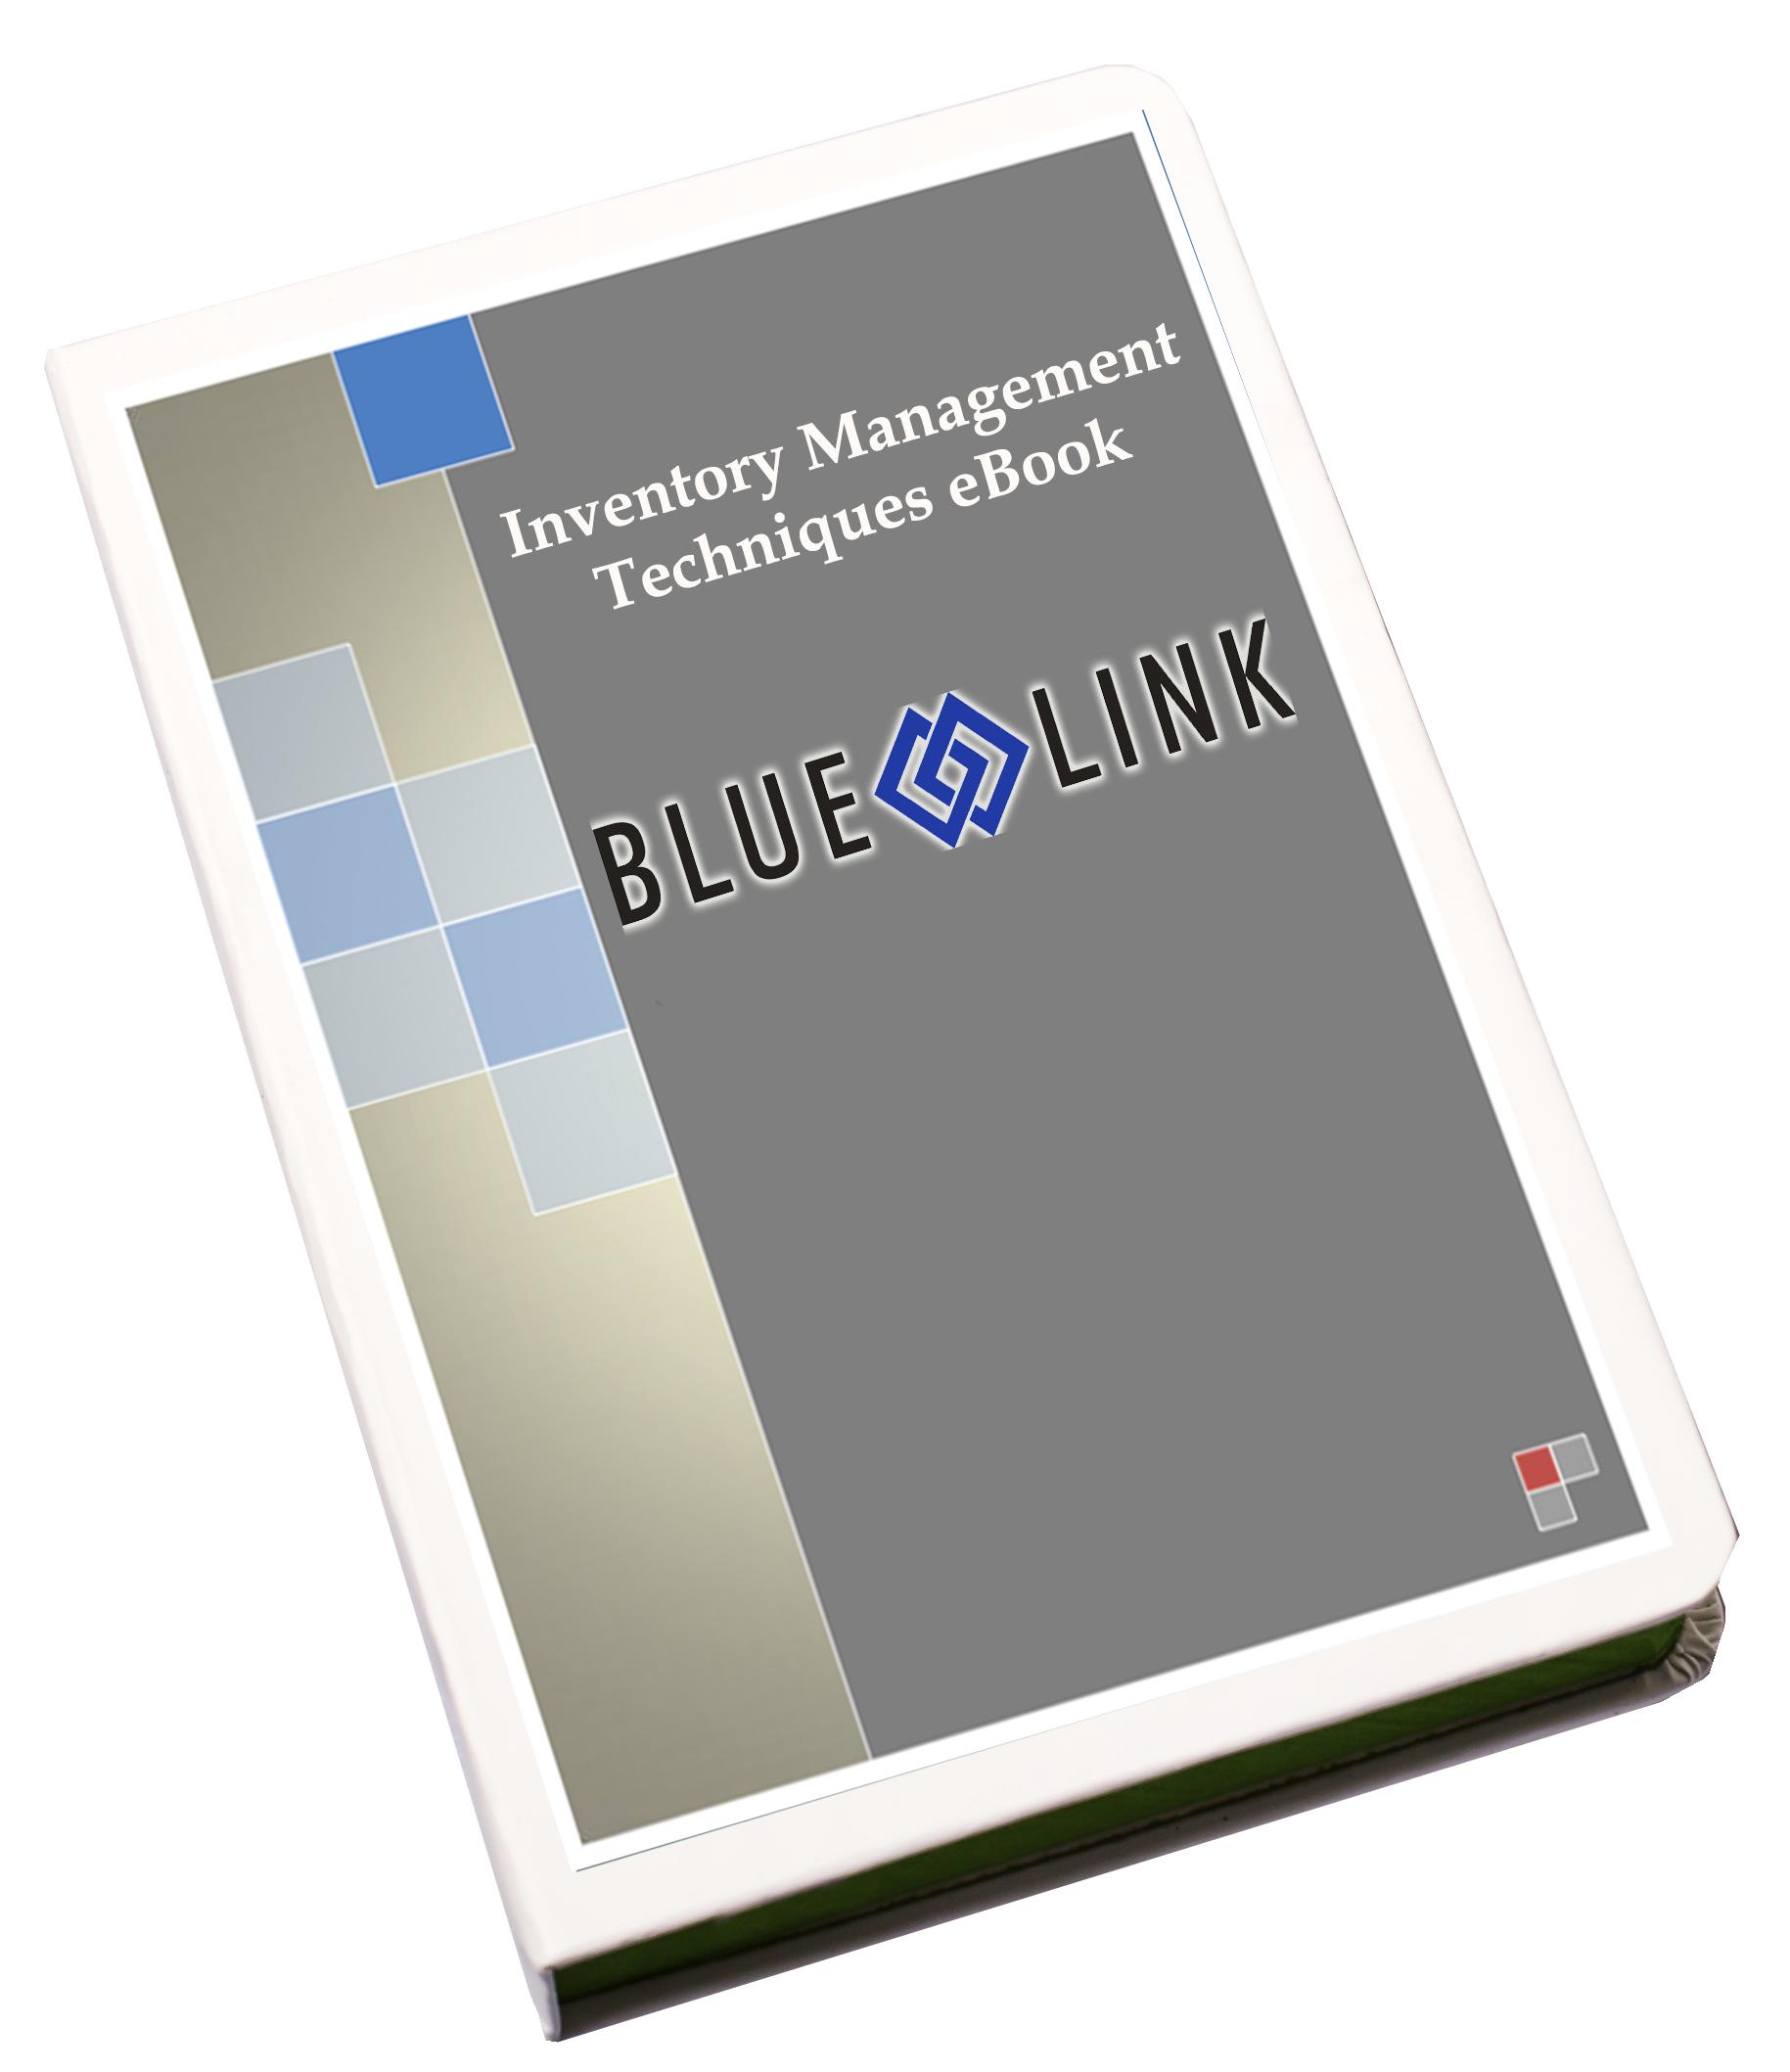 Inventory Management Techniques eBook